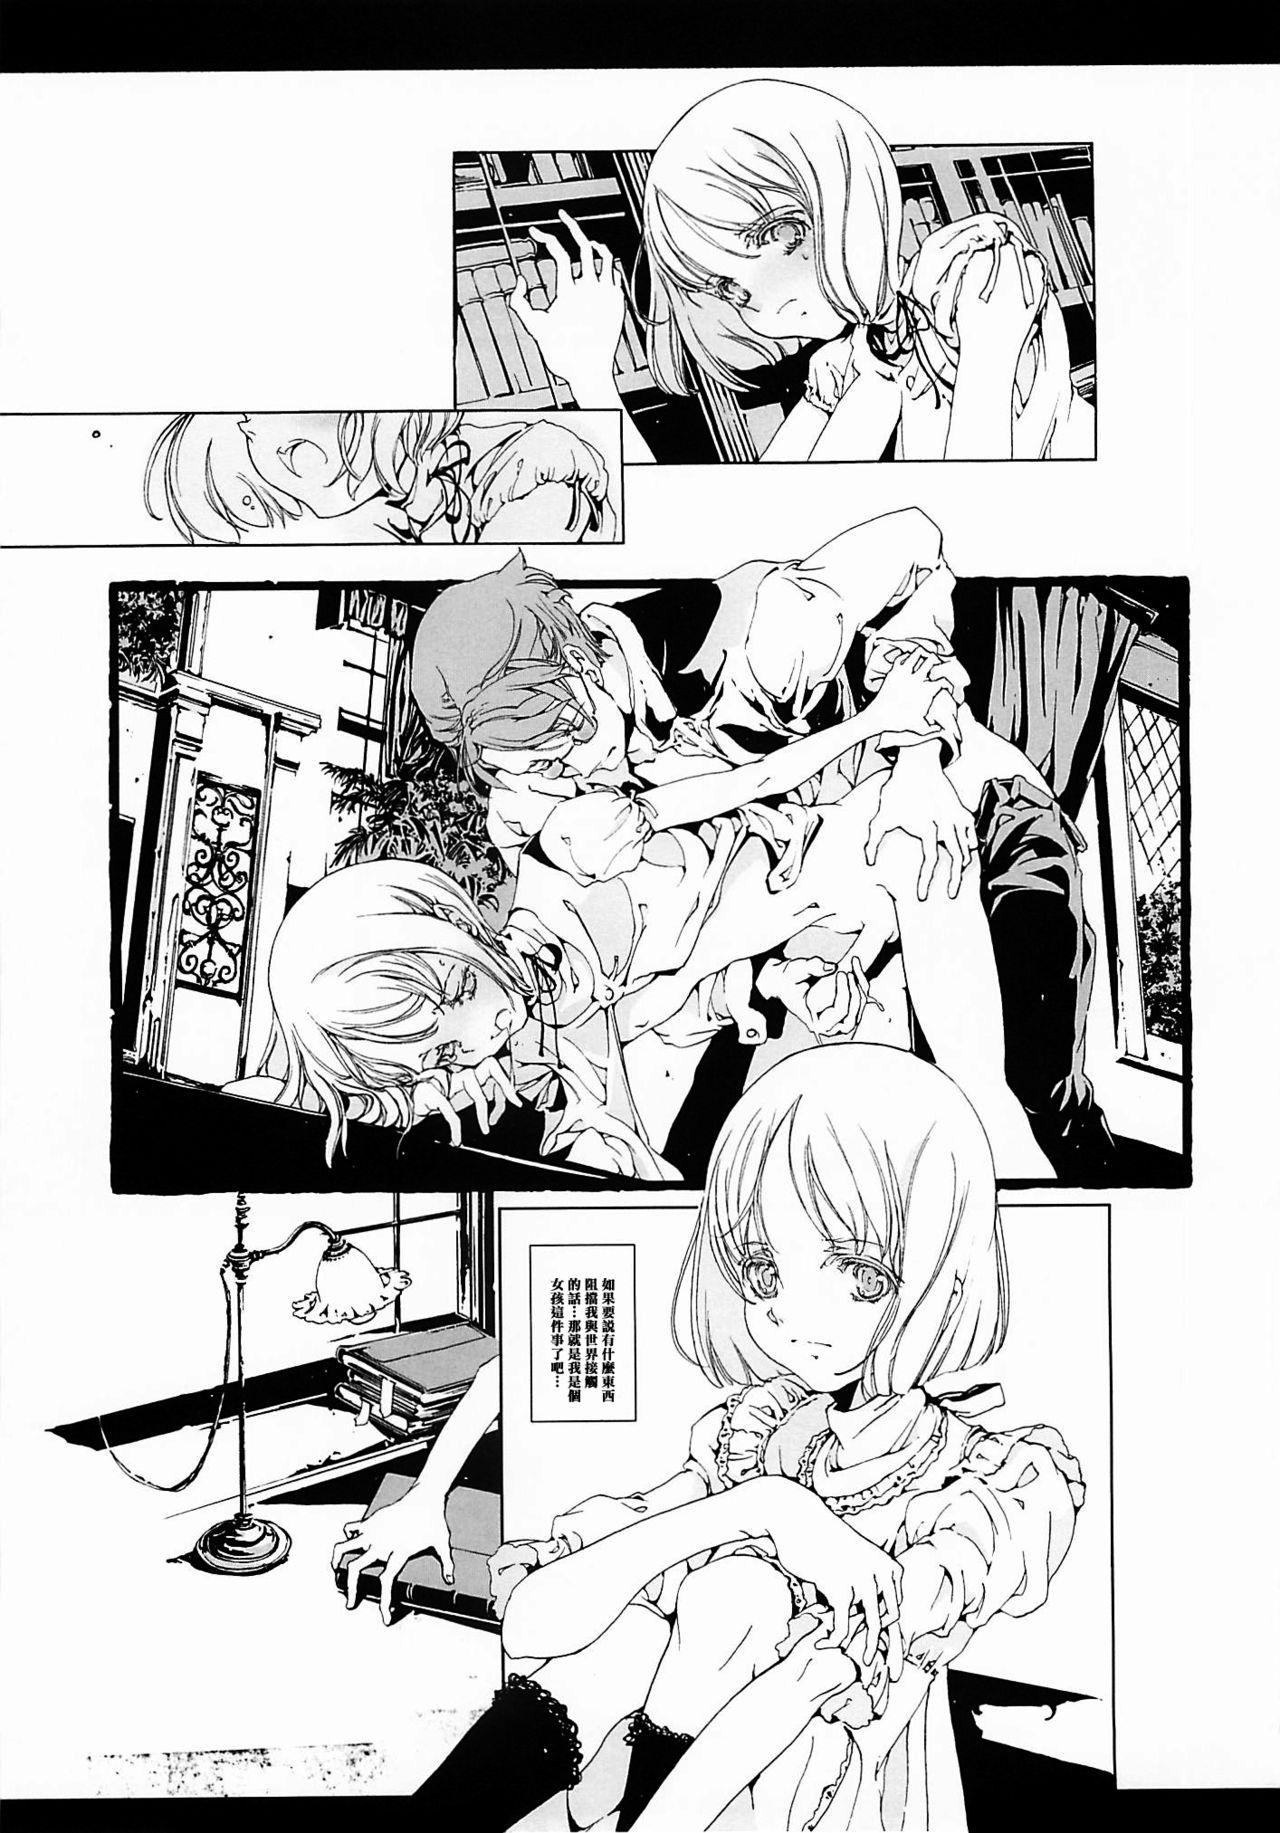 (CR37) [70 Nenshiki Yuukyuu Kikan (Endou Okito)] ORGAN-Tino  01-02[Chinese] [拾荒者汉化组] [Incomplete] 76